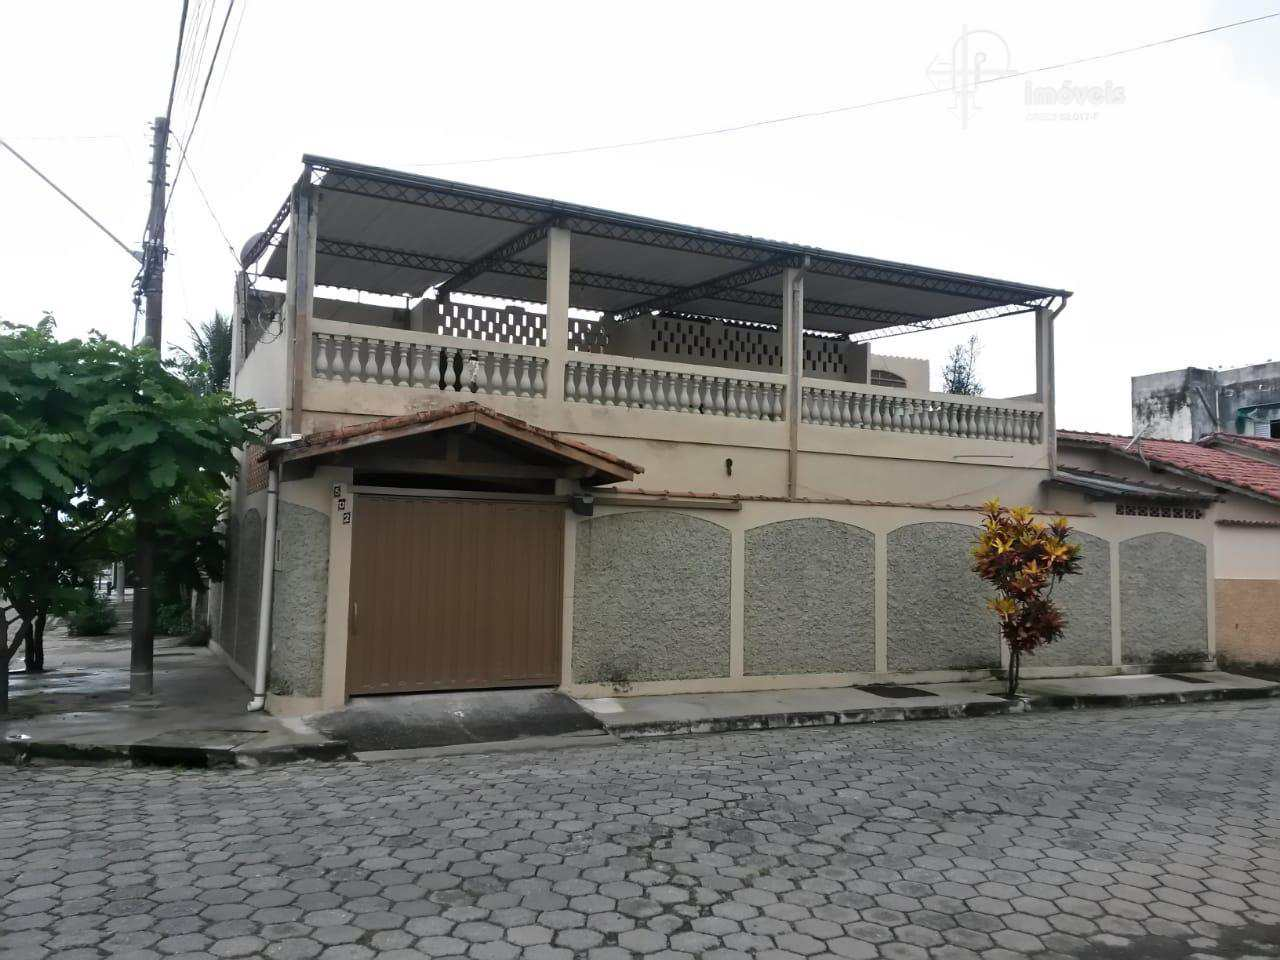 Casa com 3 dorms, Vila Nunes, Lorena - R$ 230 mil, Cod: 61537906